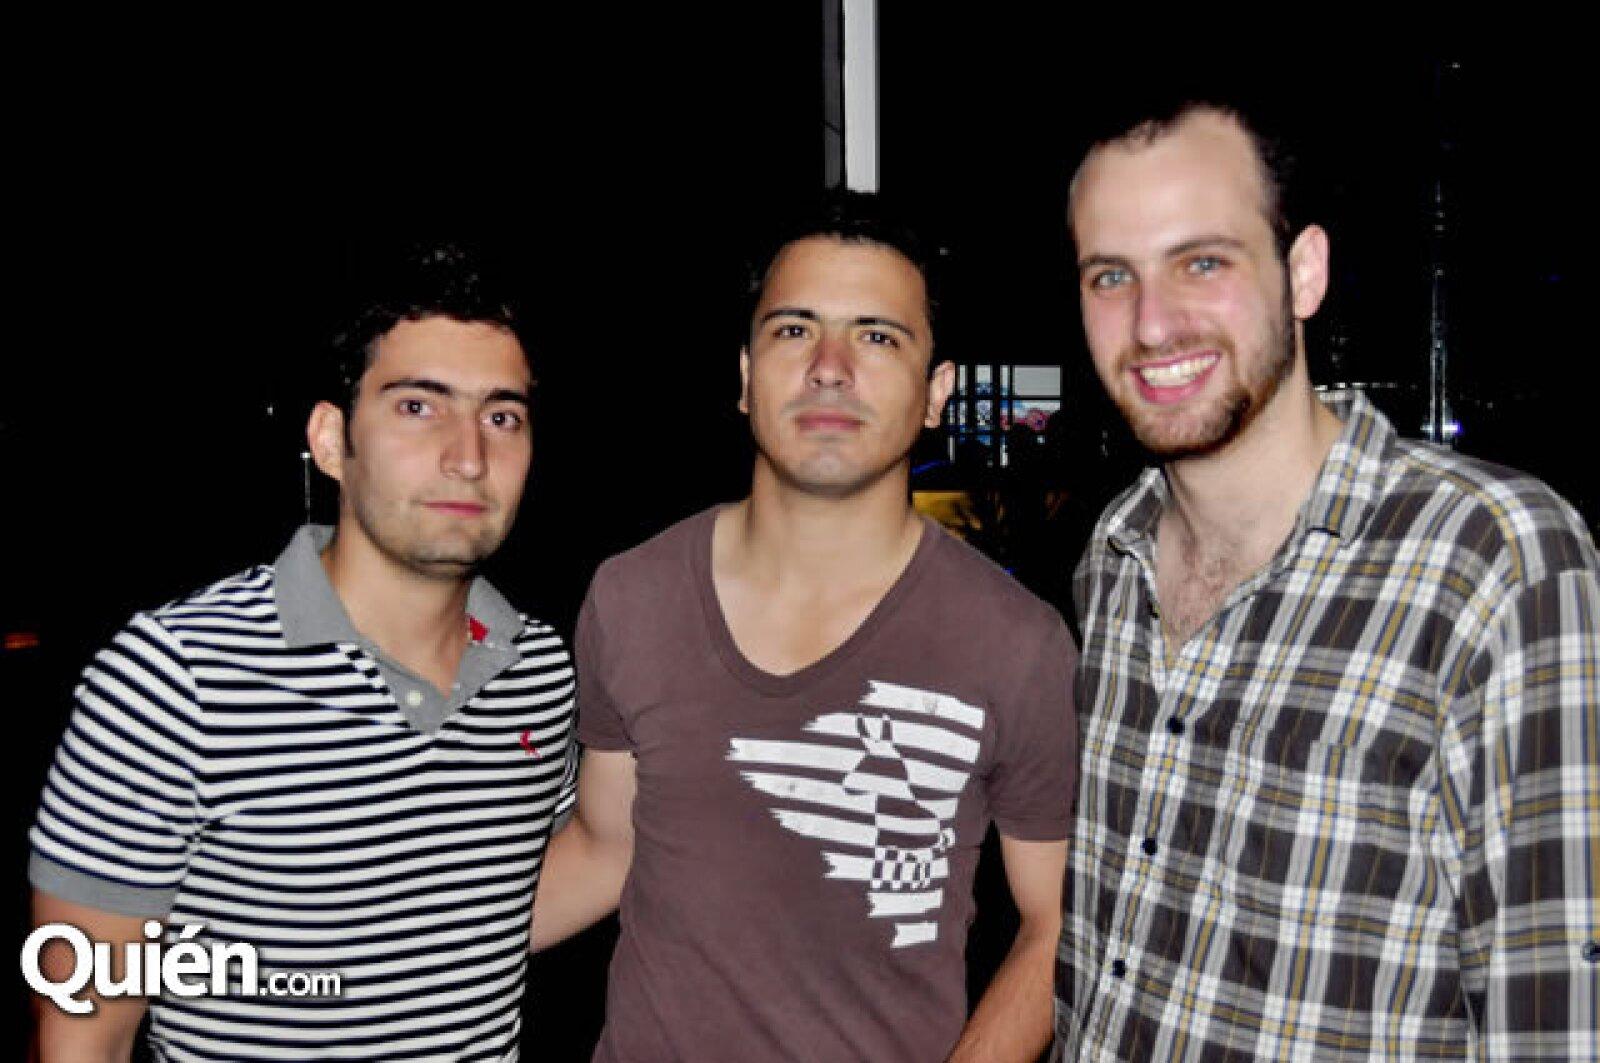 Humberto Salinas, Alain Duthoy y Rafael Chousal